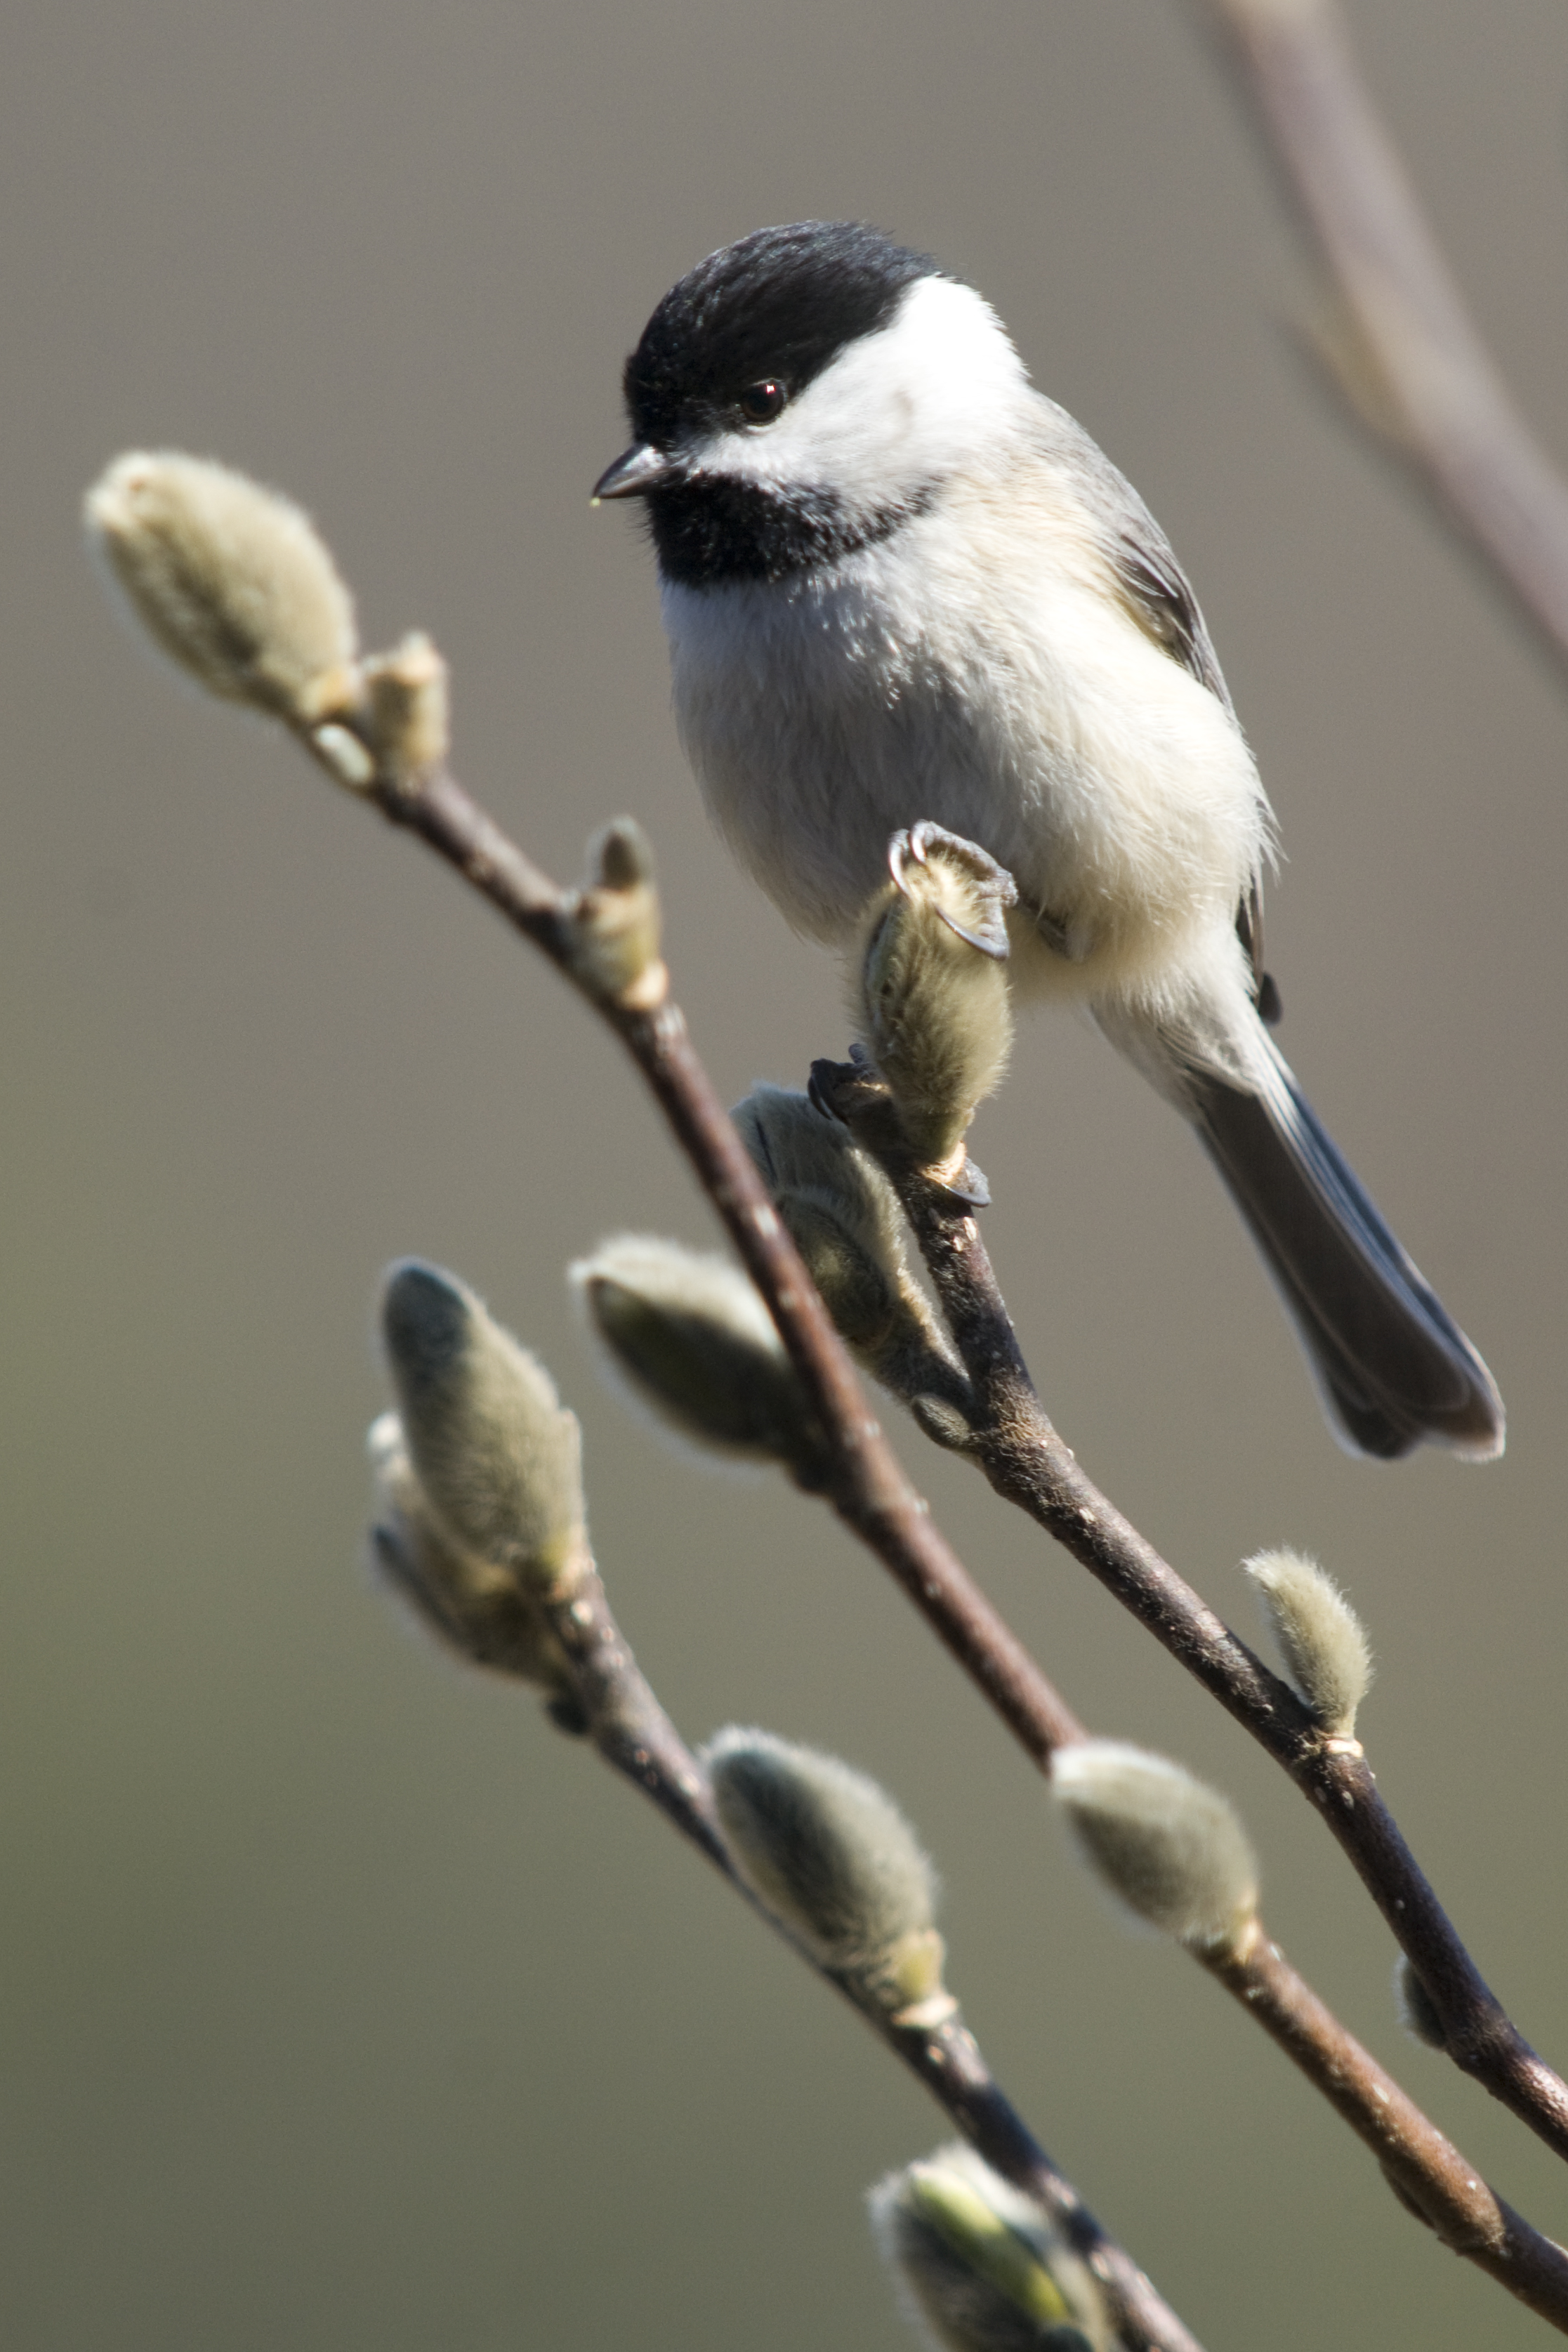 Carolina Chickadee, Michele Black/Great Backyard Bird Count